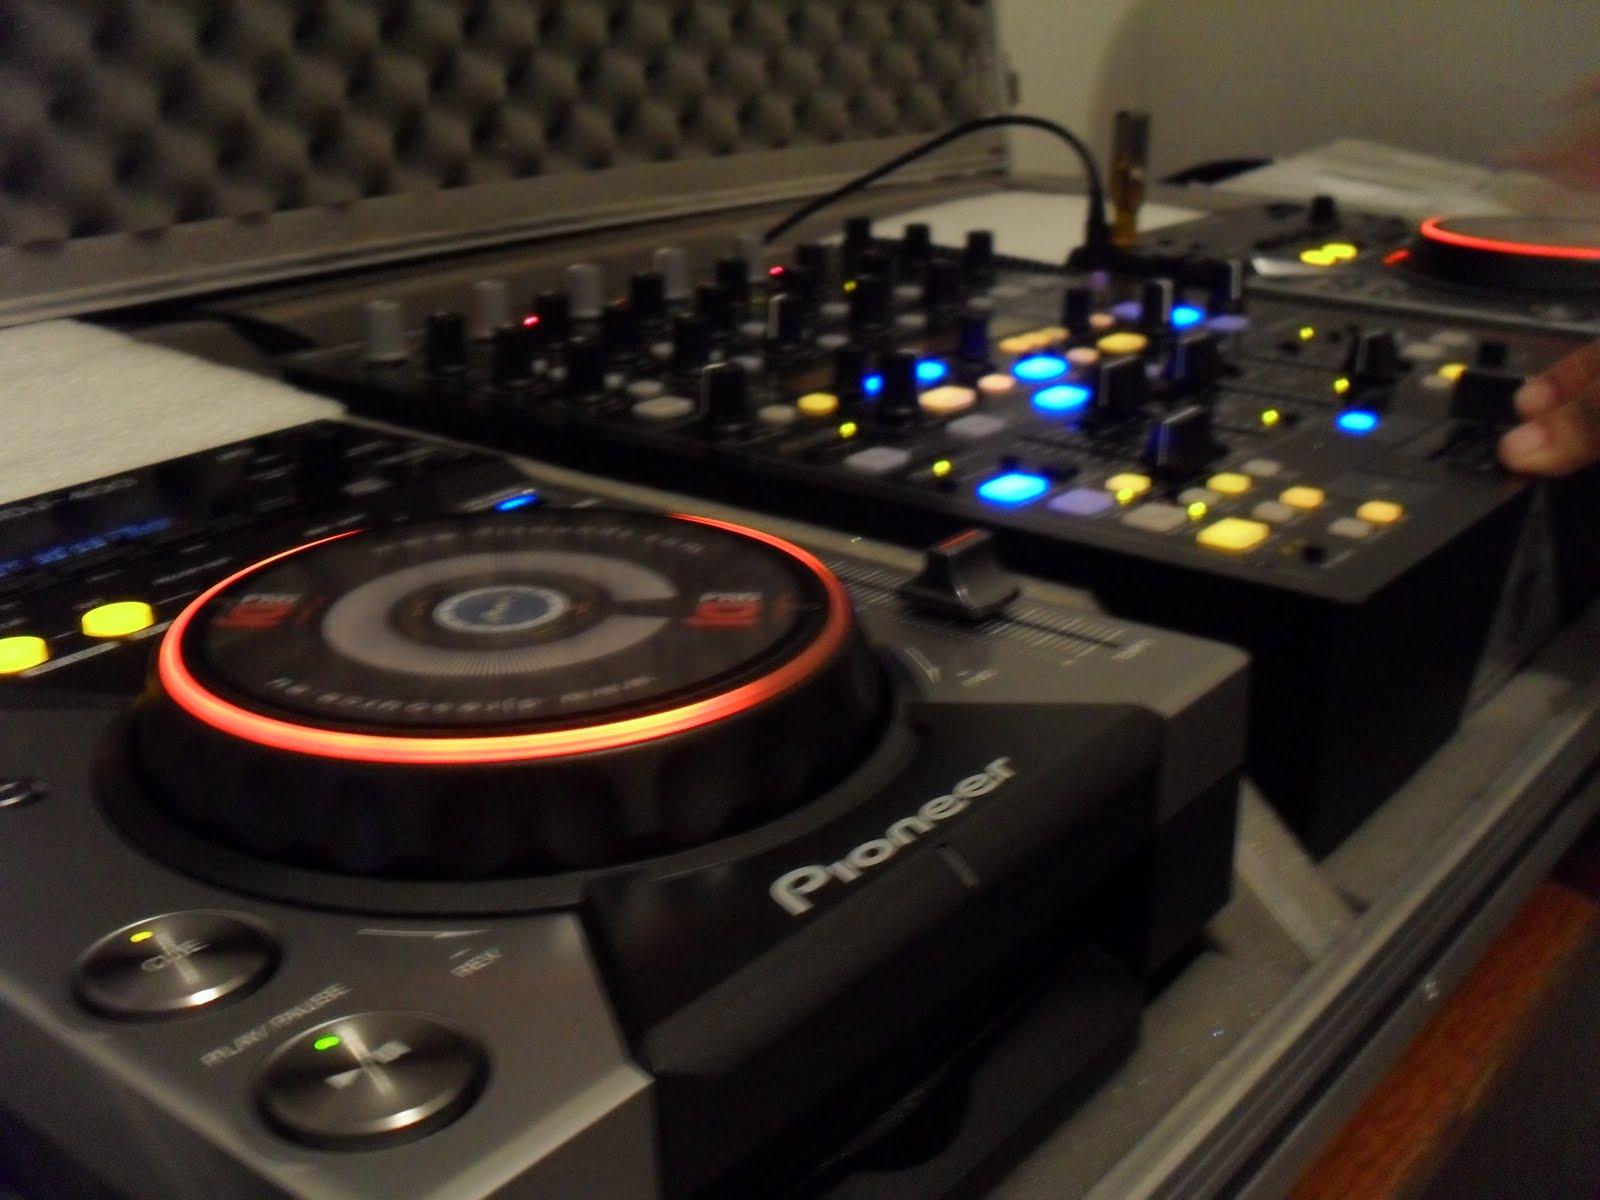 Djs top mt house music set dj xarres jan 2011 for House music set